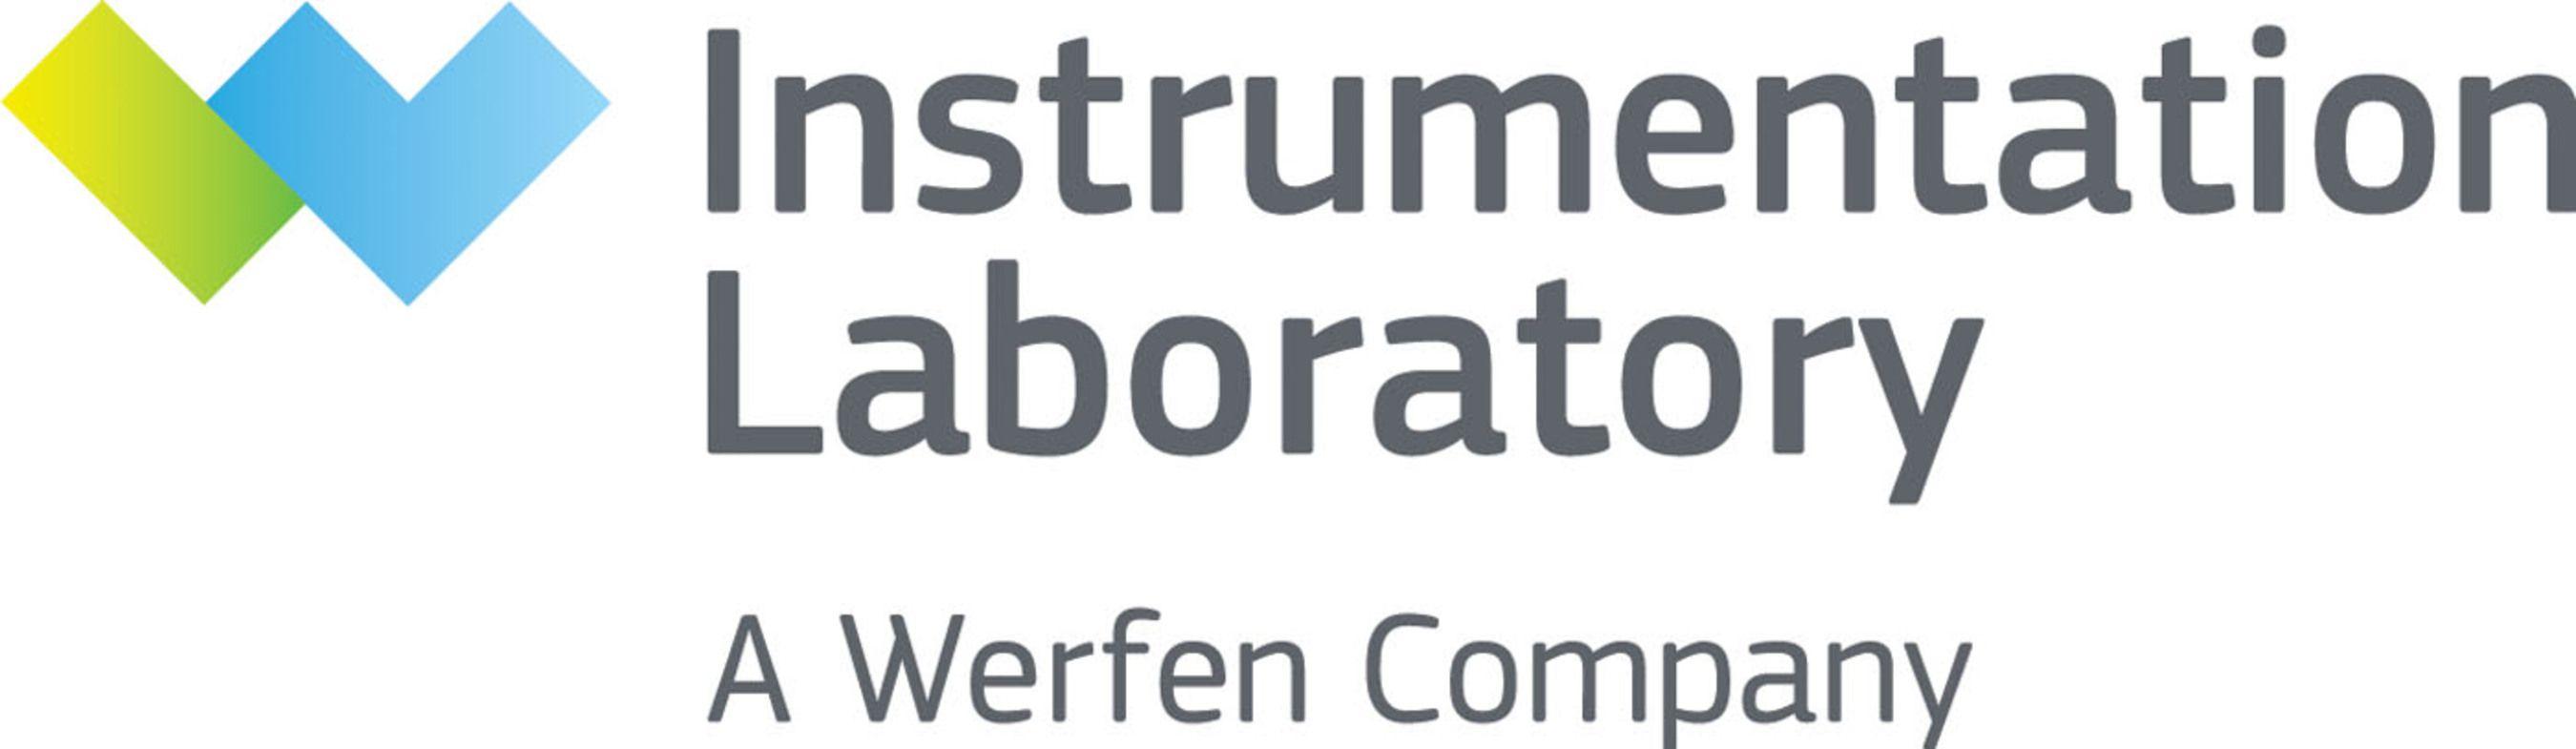 Instrumentation Laboratory